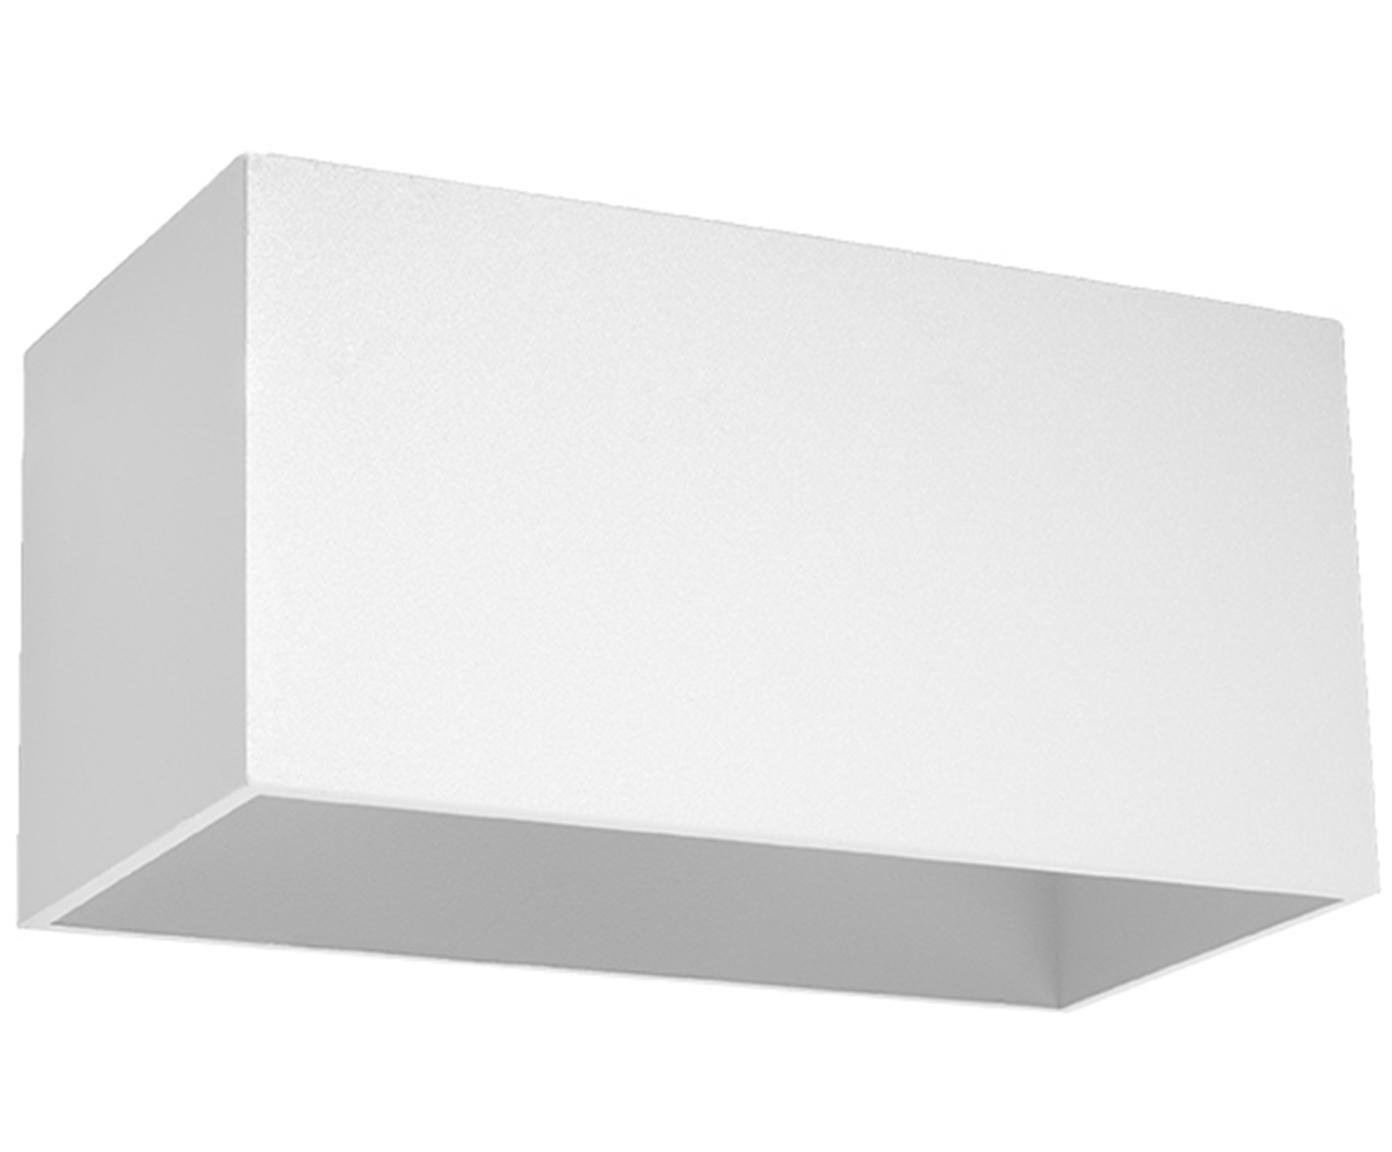 Wandleuchte Geo Maxi, Aluminium, Weiss, 20 x 10 cm